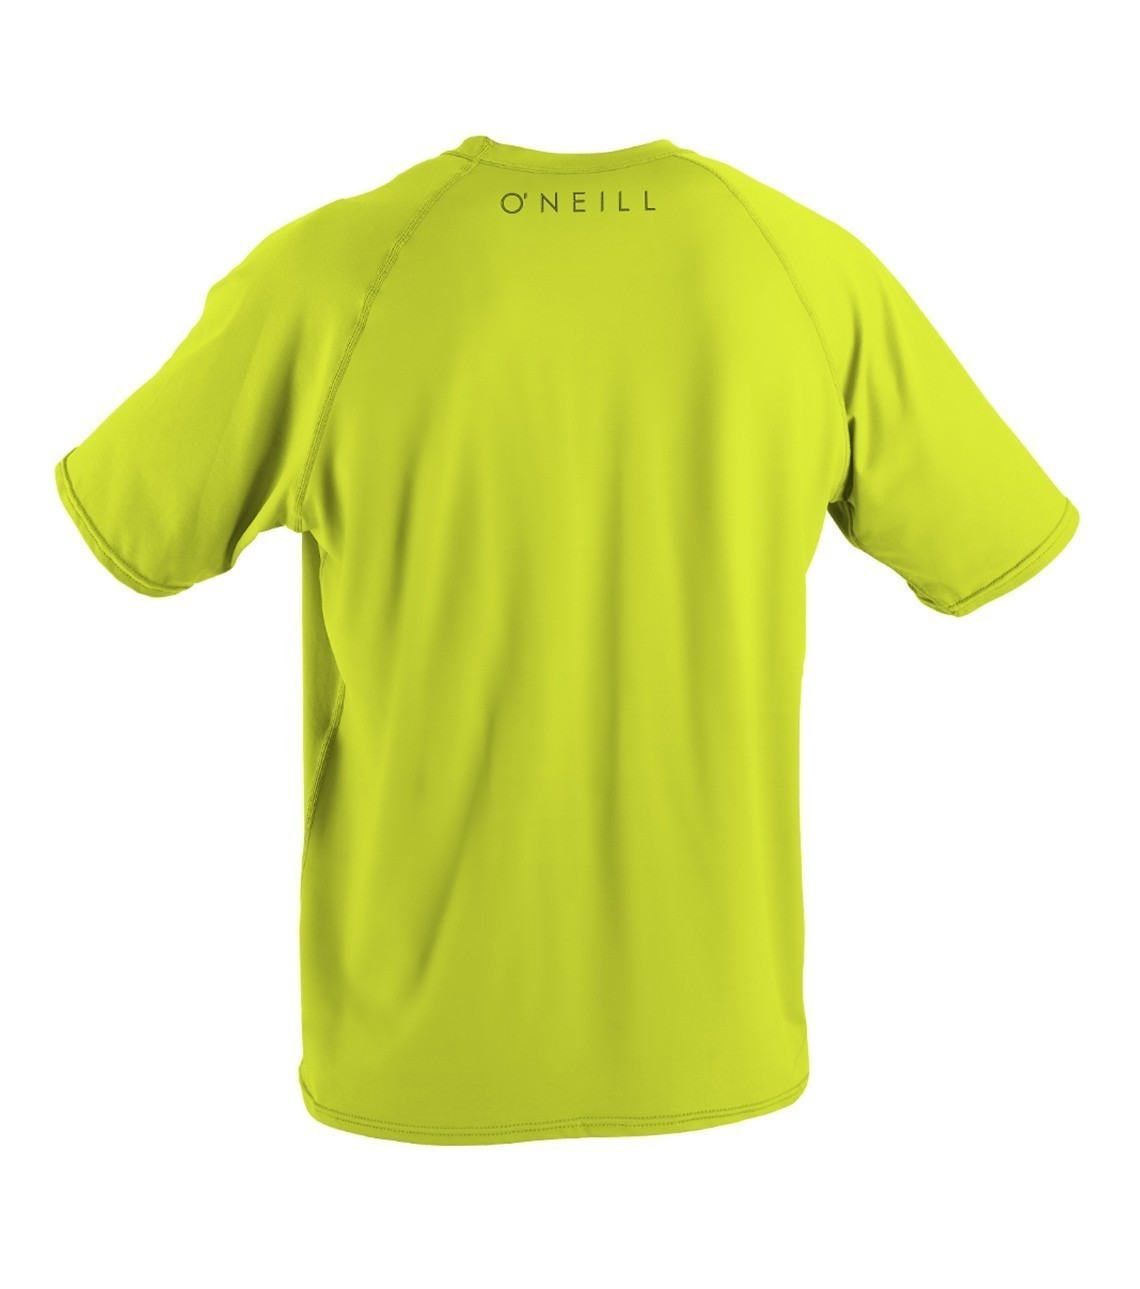 oneill men's short sleeve rash guard lime back